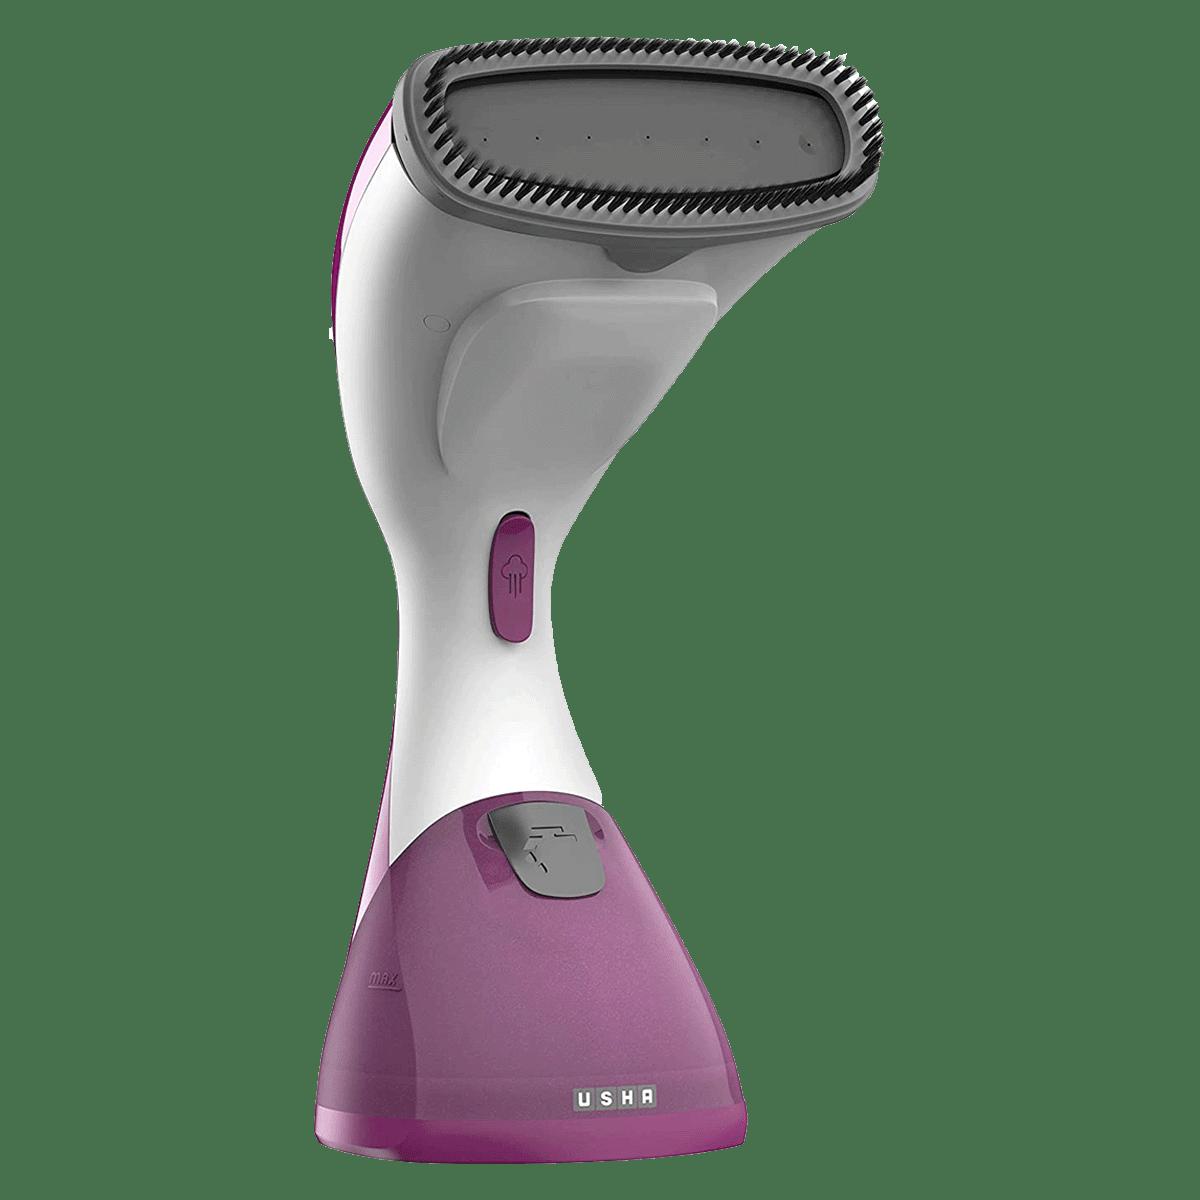 Usha Techne 1000 Watts 200 ml Garment Steamer (TechneGS, Purple)